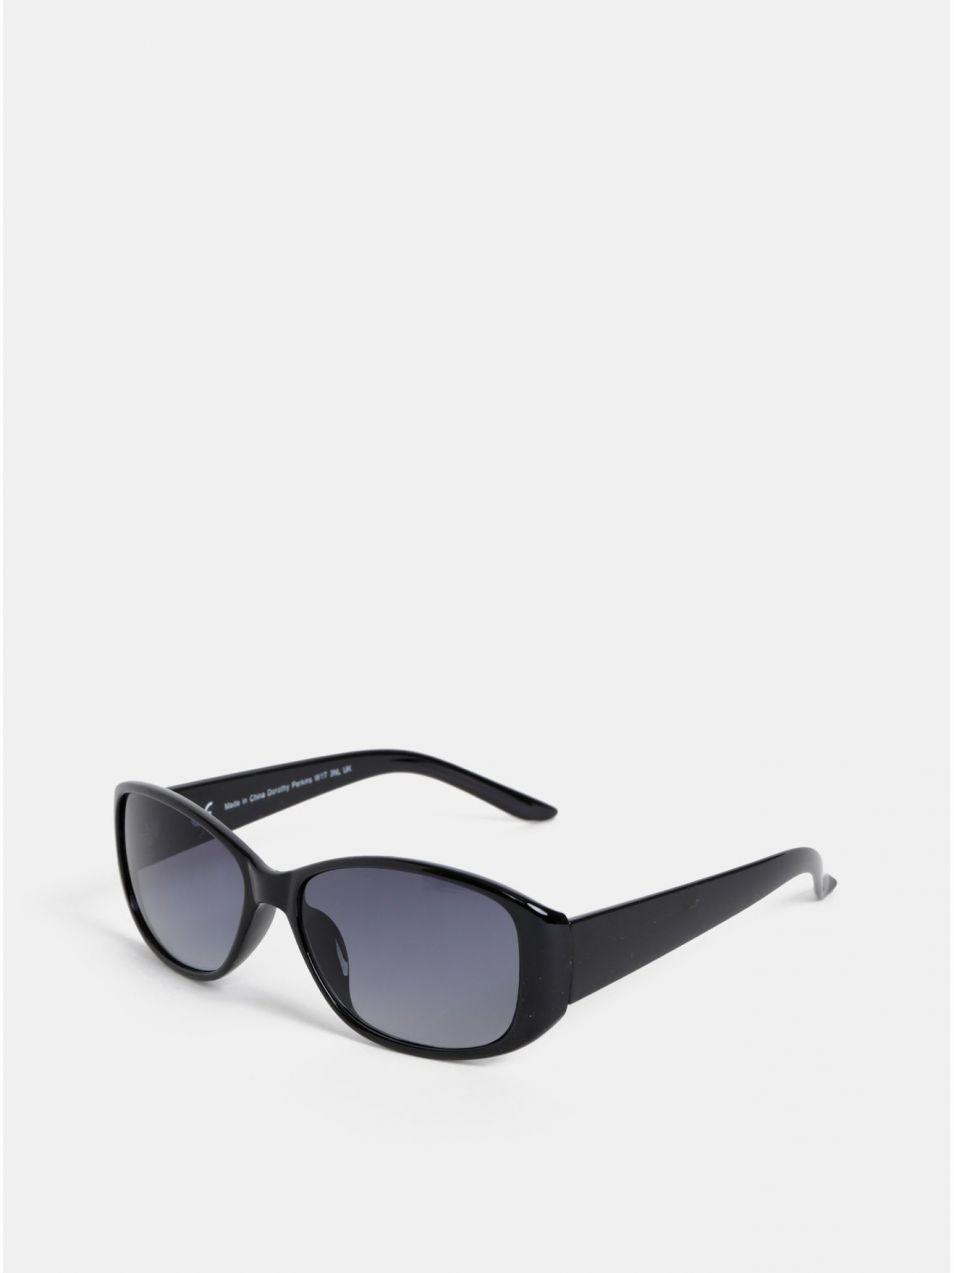 d569121f6 Čierne slnečné okuliare Dorothy Perkins značky Dorothy Perkins - Lovely.sk